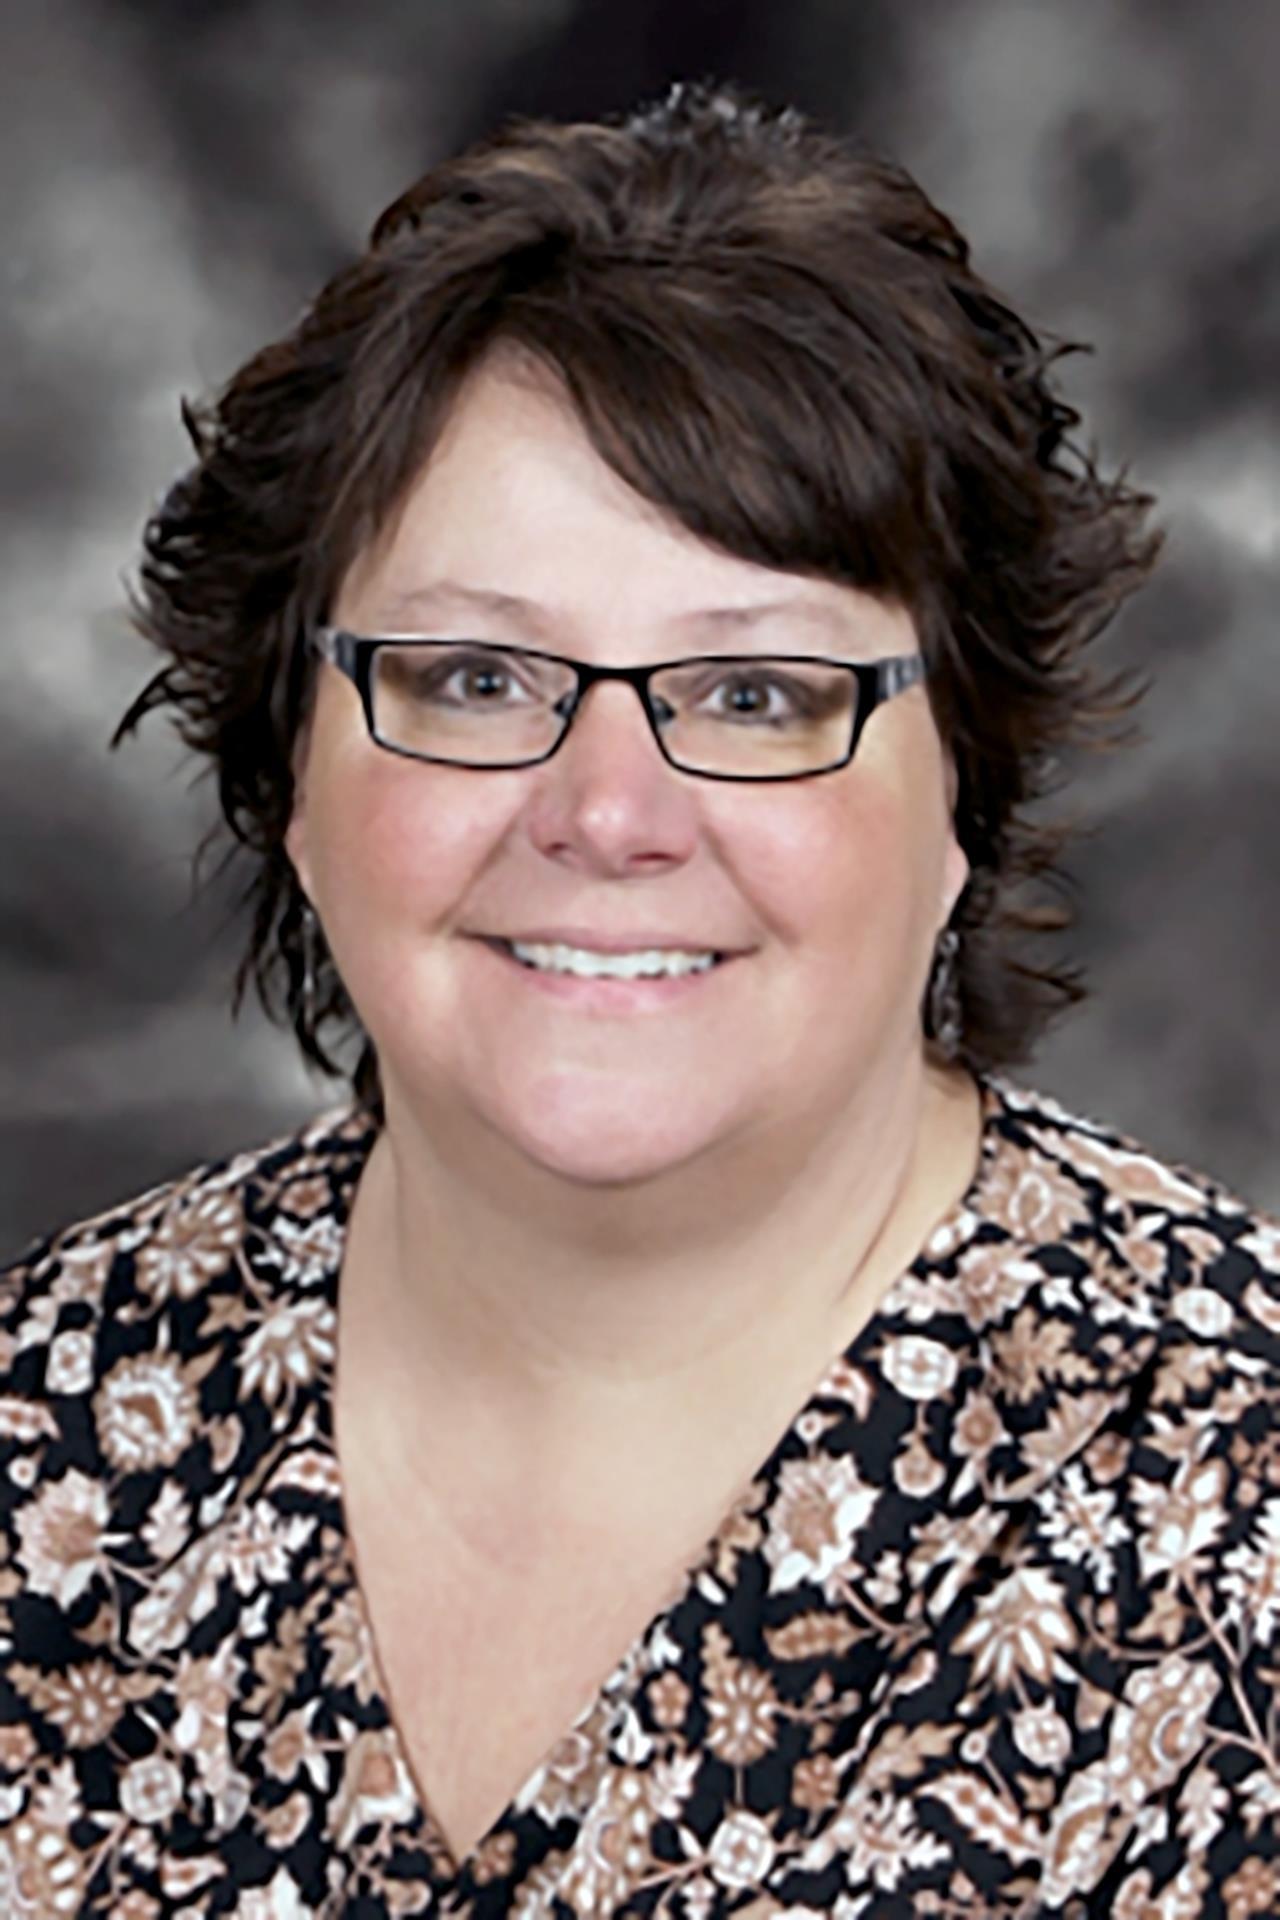 District Clerk Tammi Wadeson